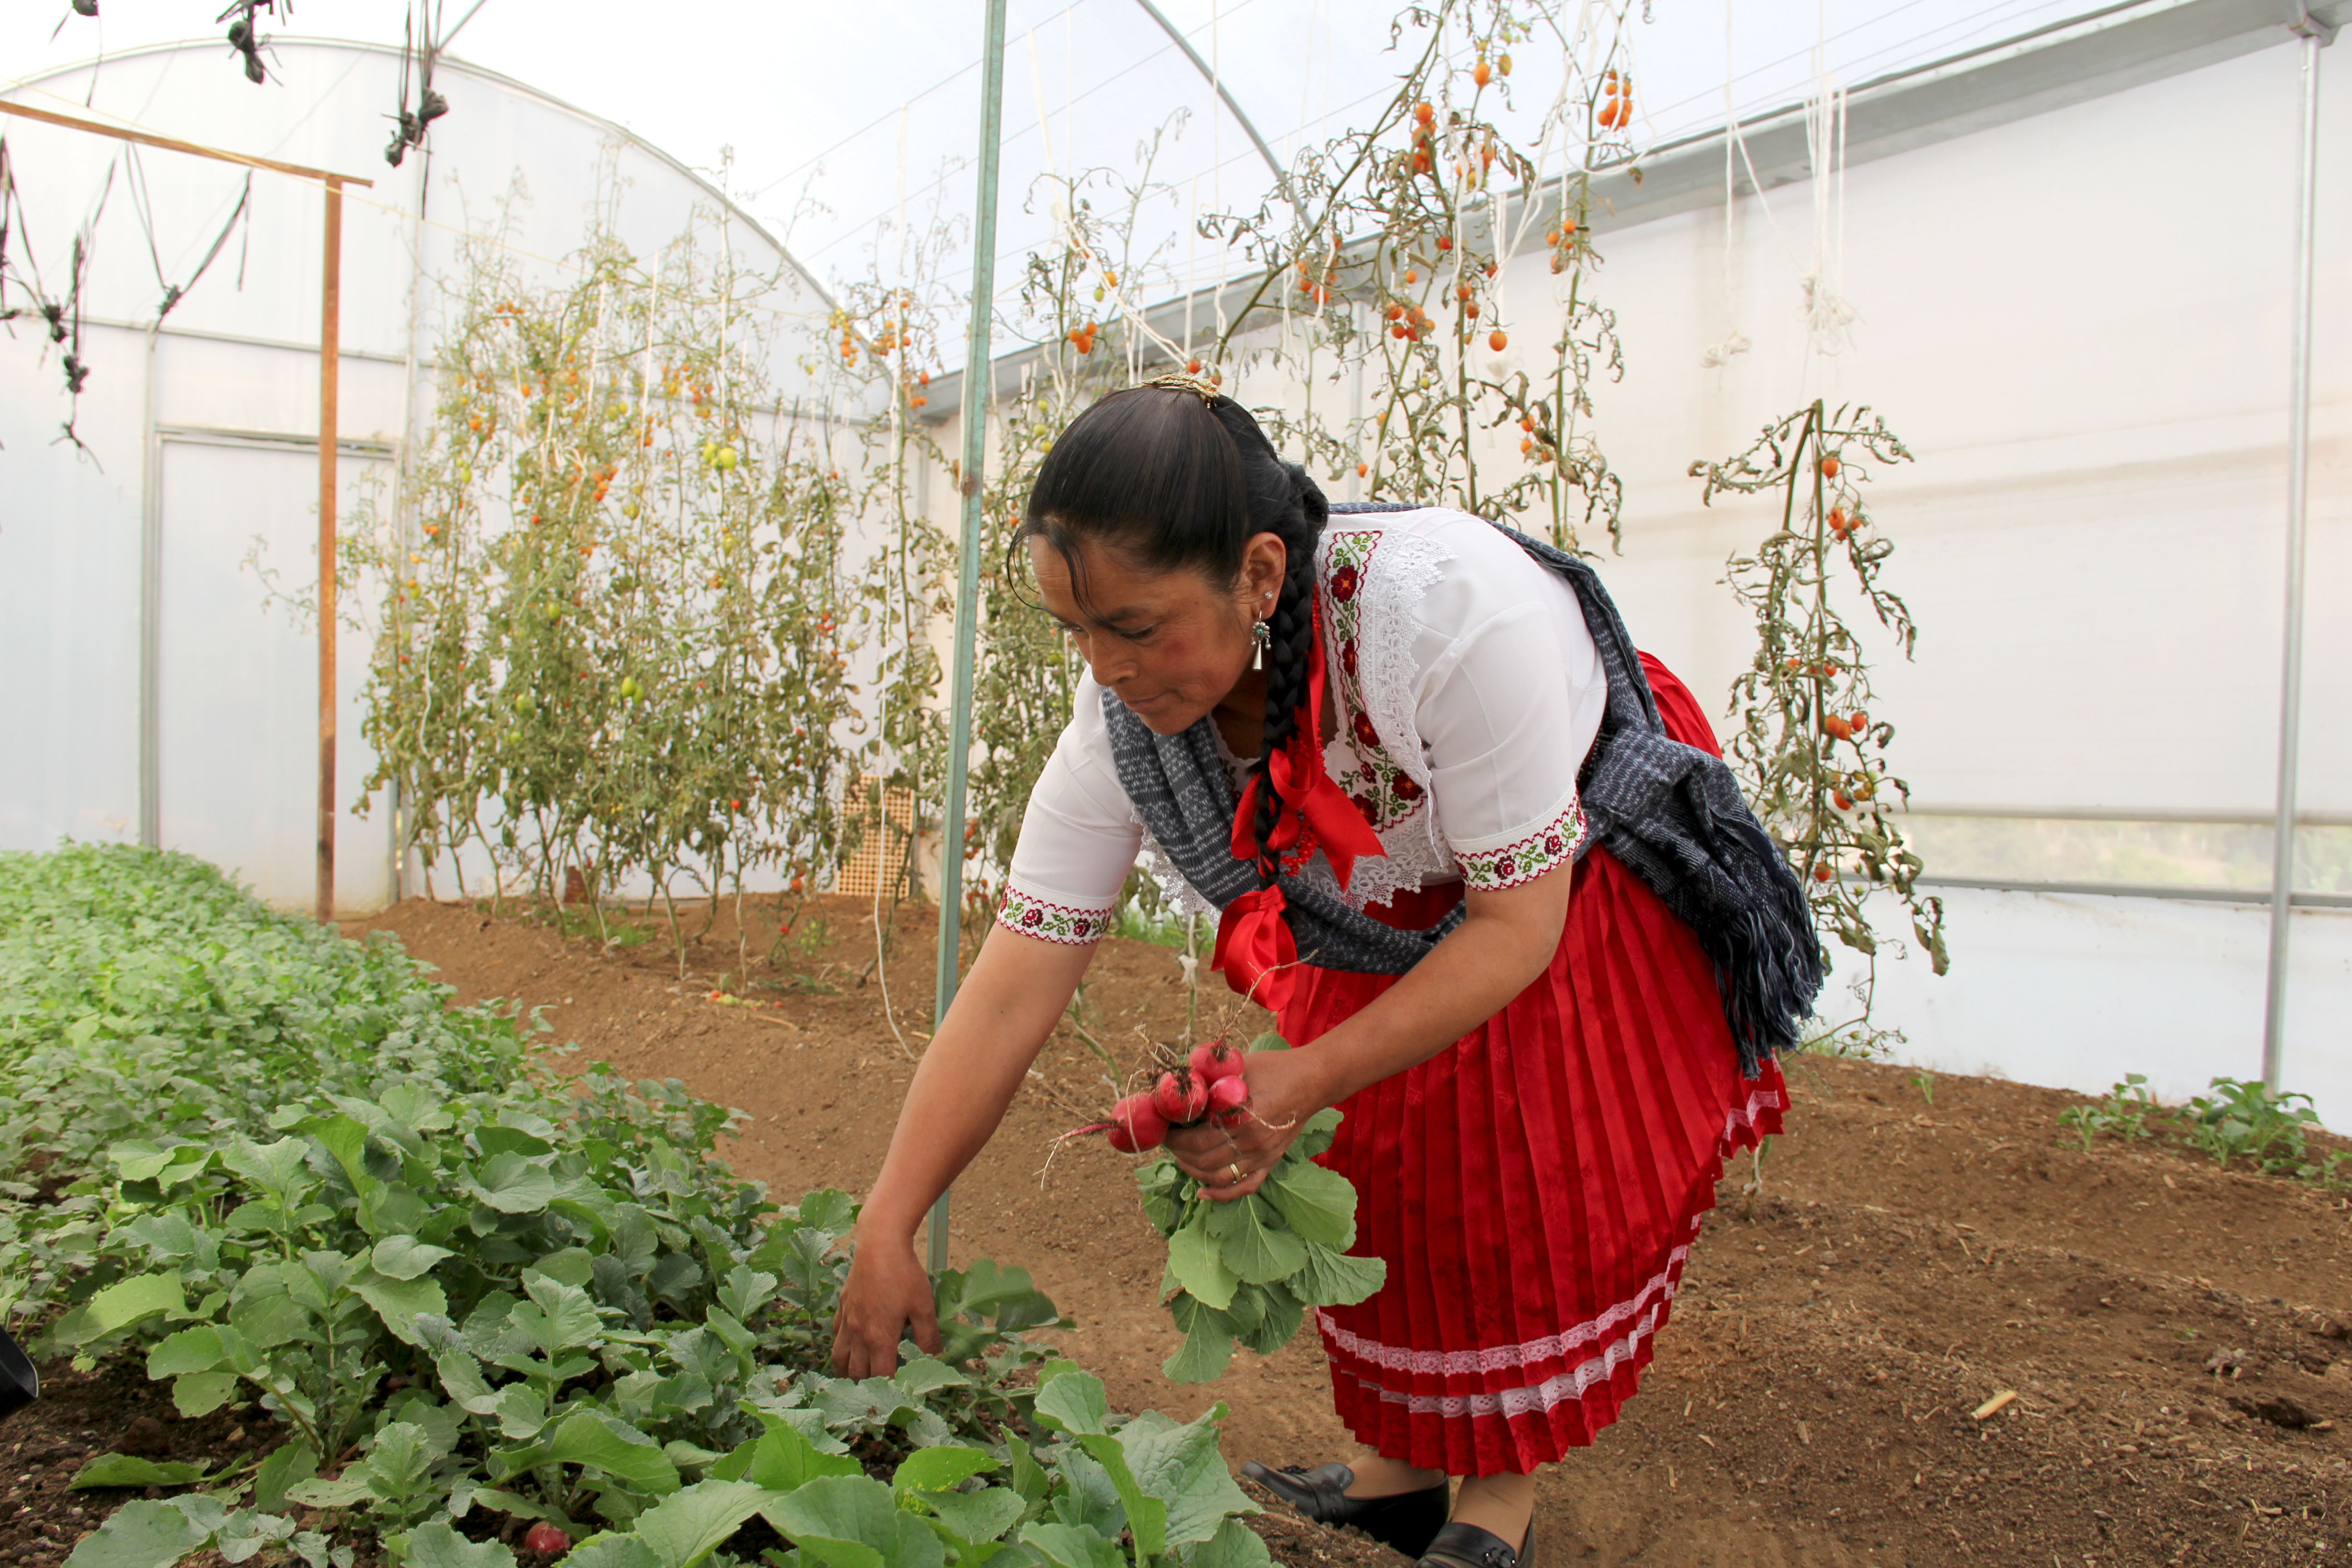 Mujer PROSPERA, Estado de México.